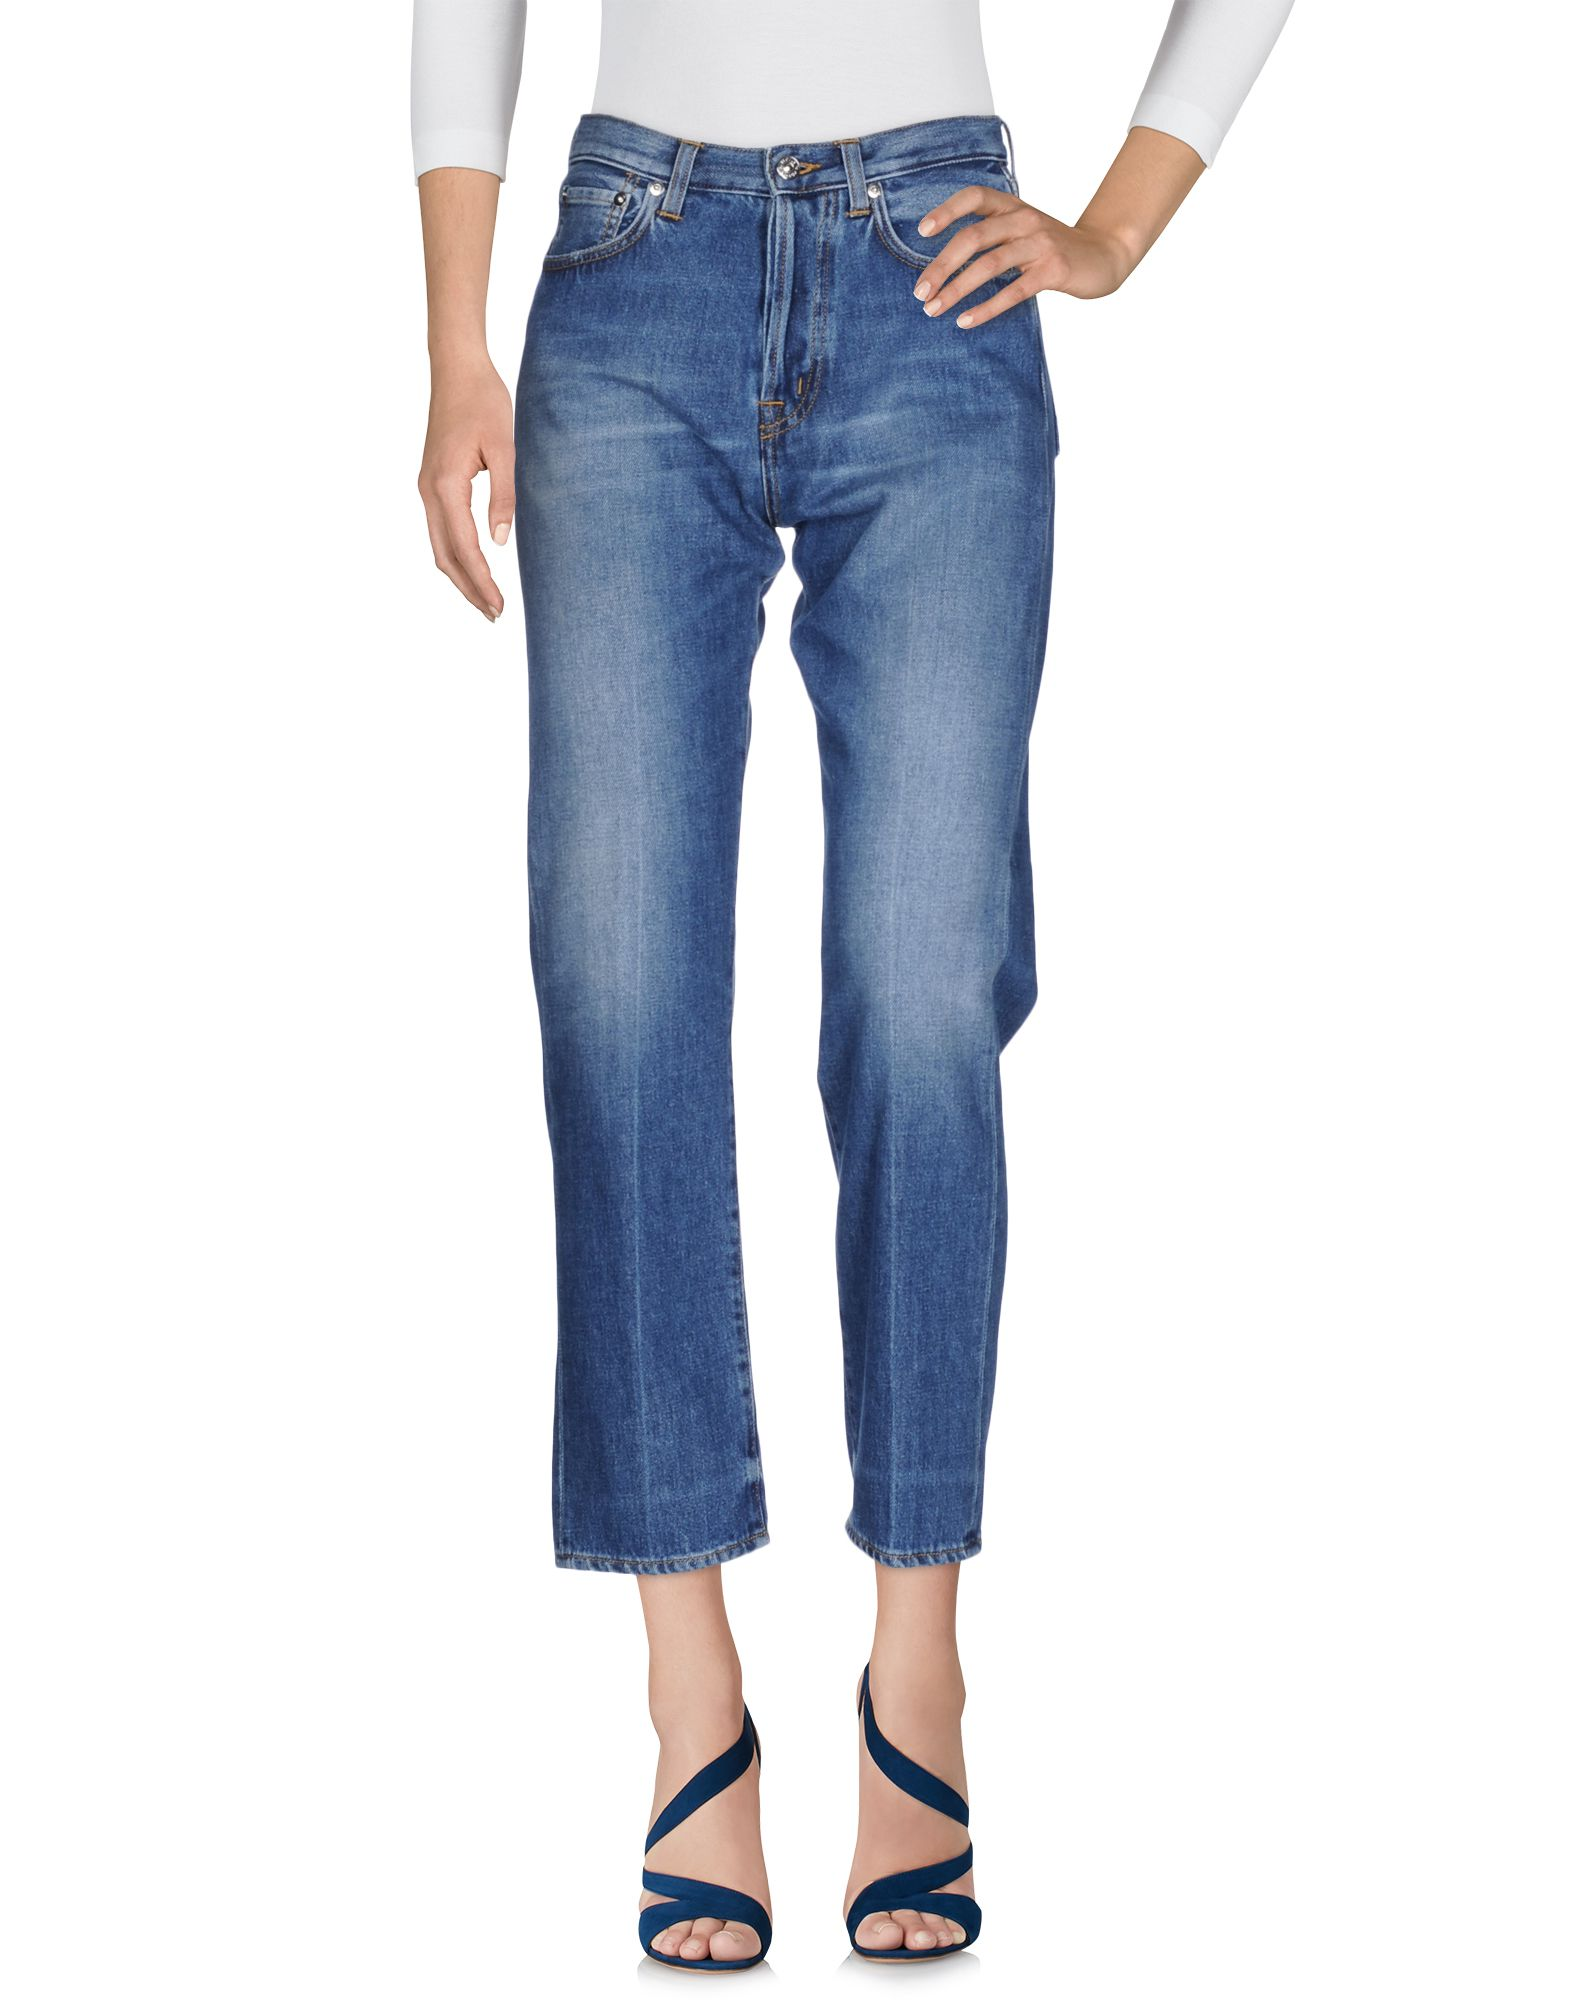 (+) PEOPLE Damen Jeanshose Farbe Blau Größe 7 - broschei